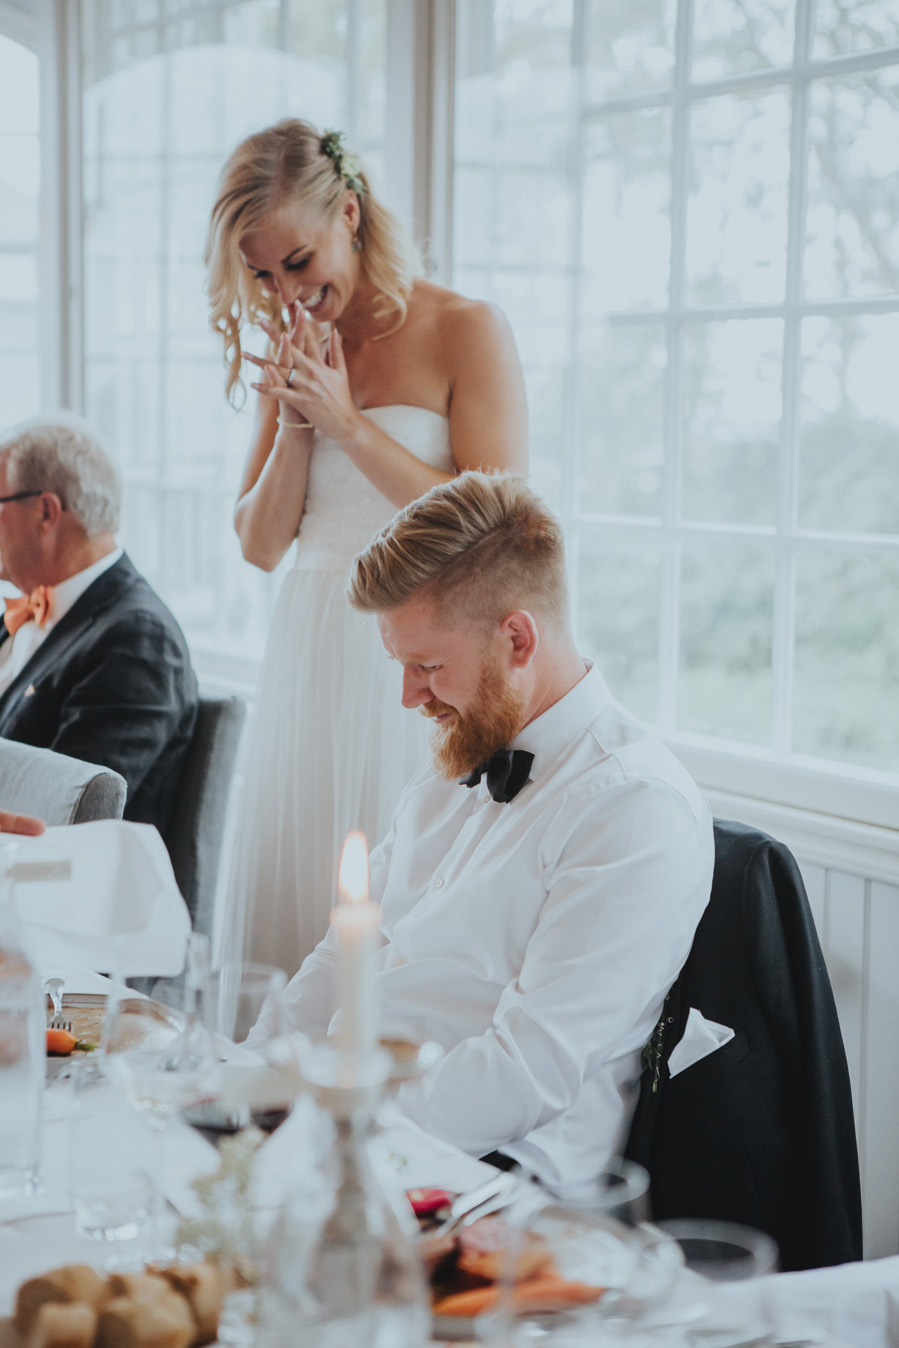 känslor,tal,bröllop,vitemölla